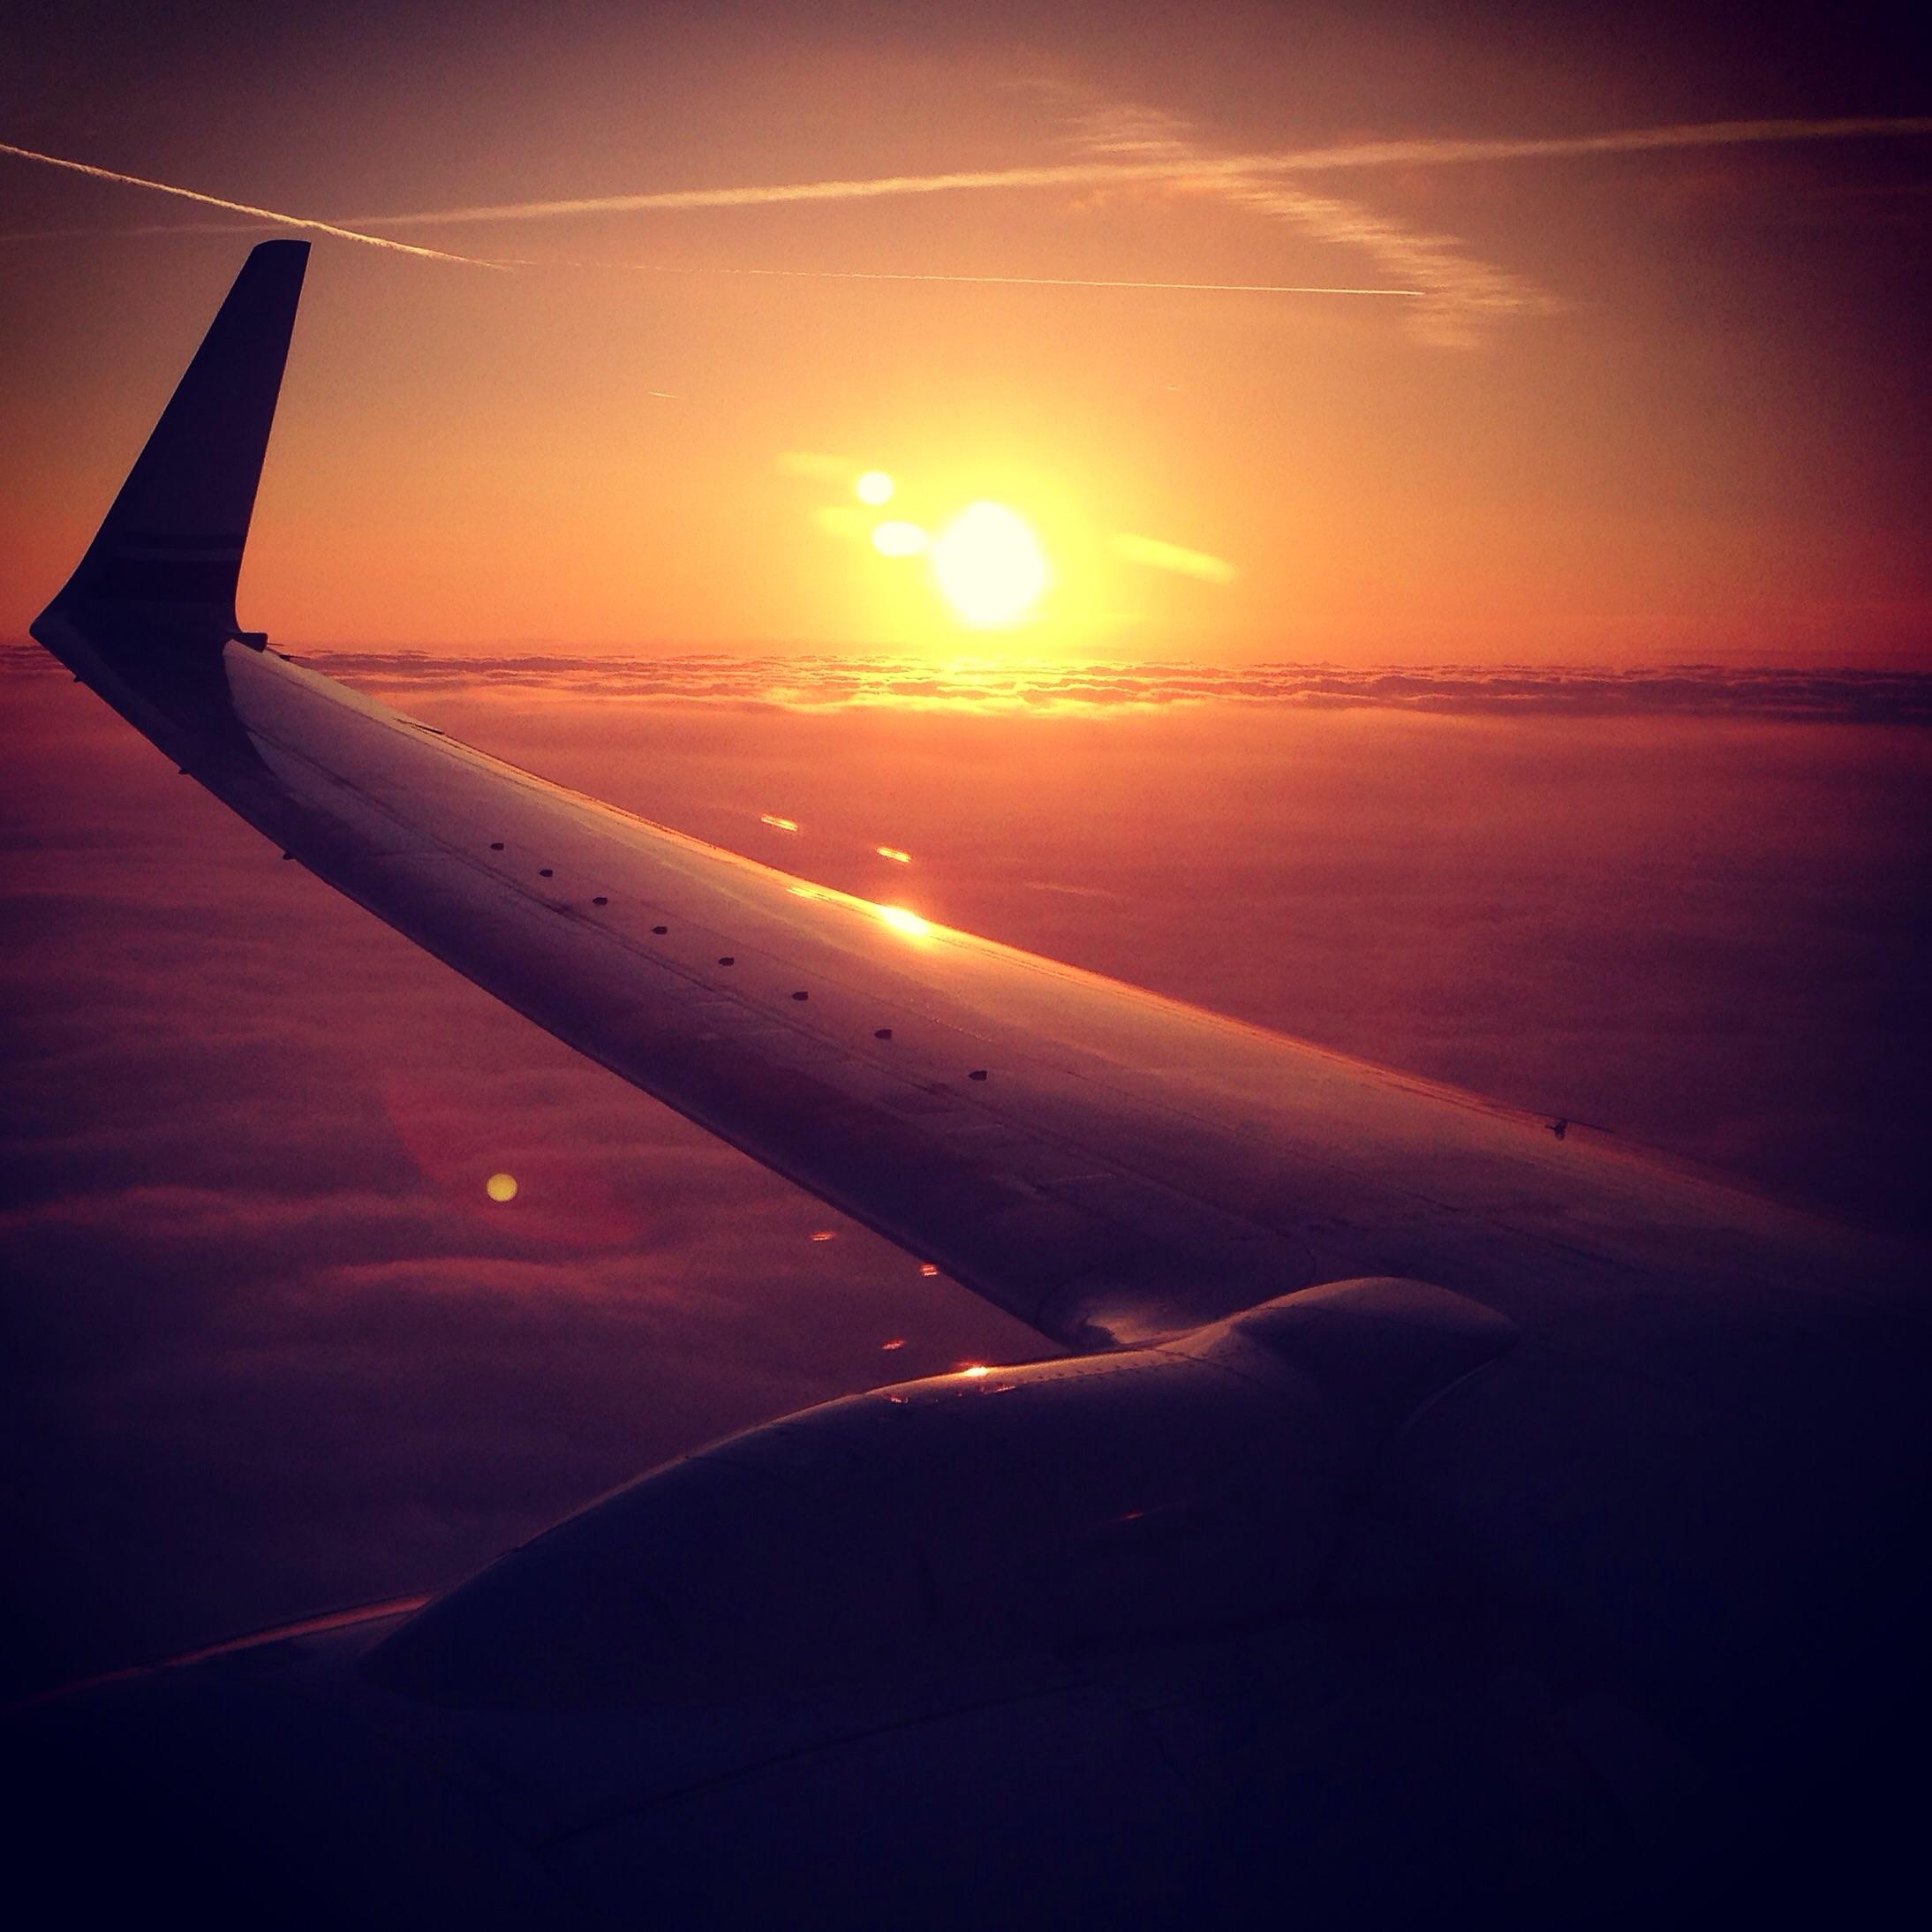 Somewhere over Chicago...